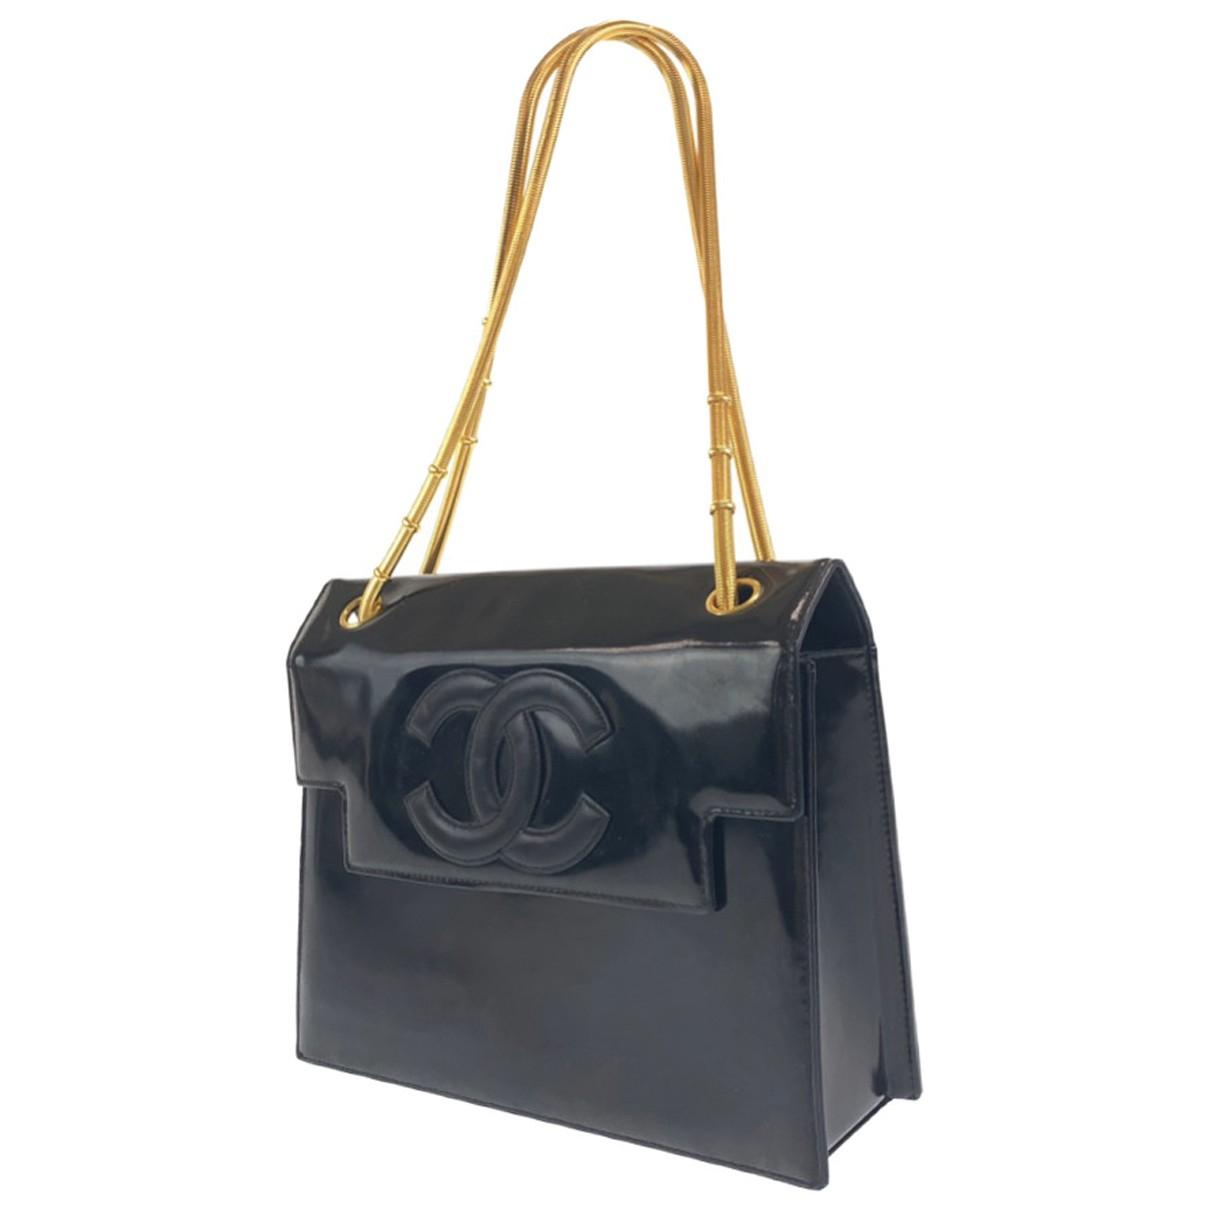 Bolso de Charol Chanel